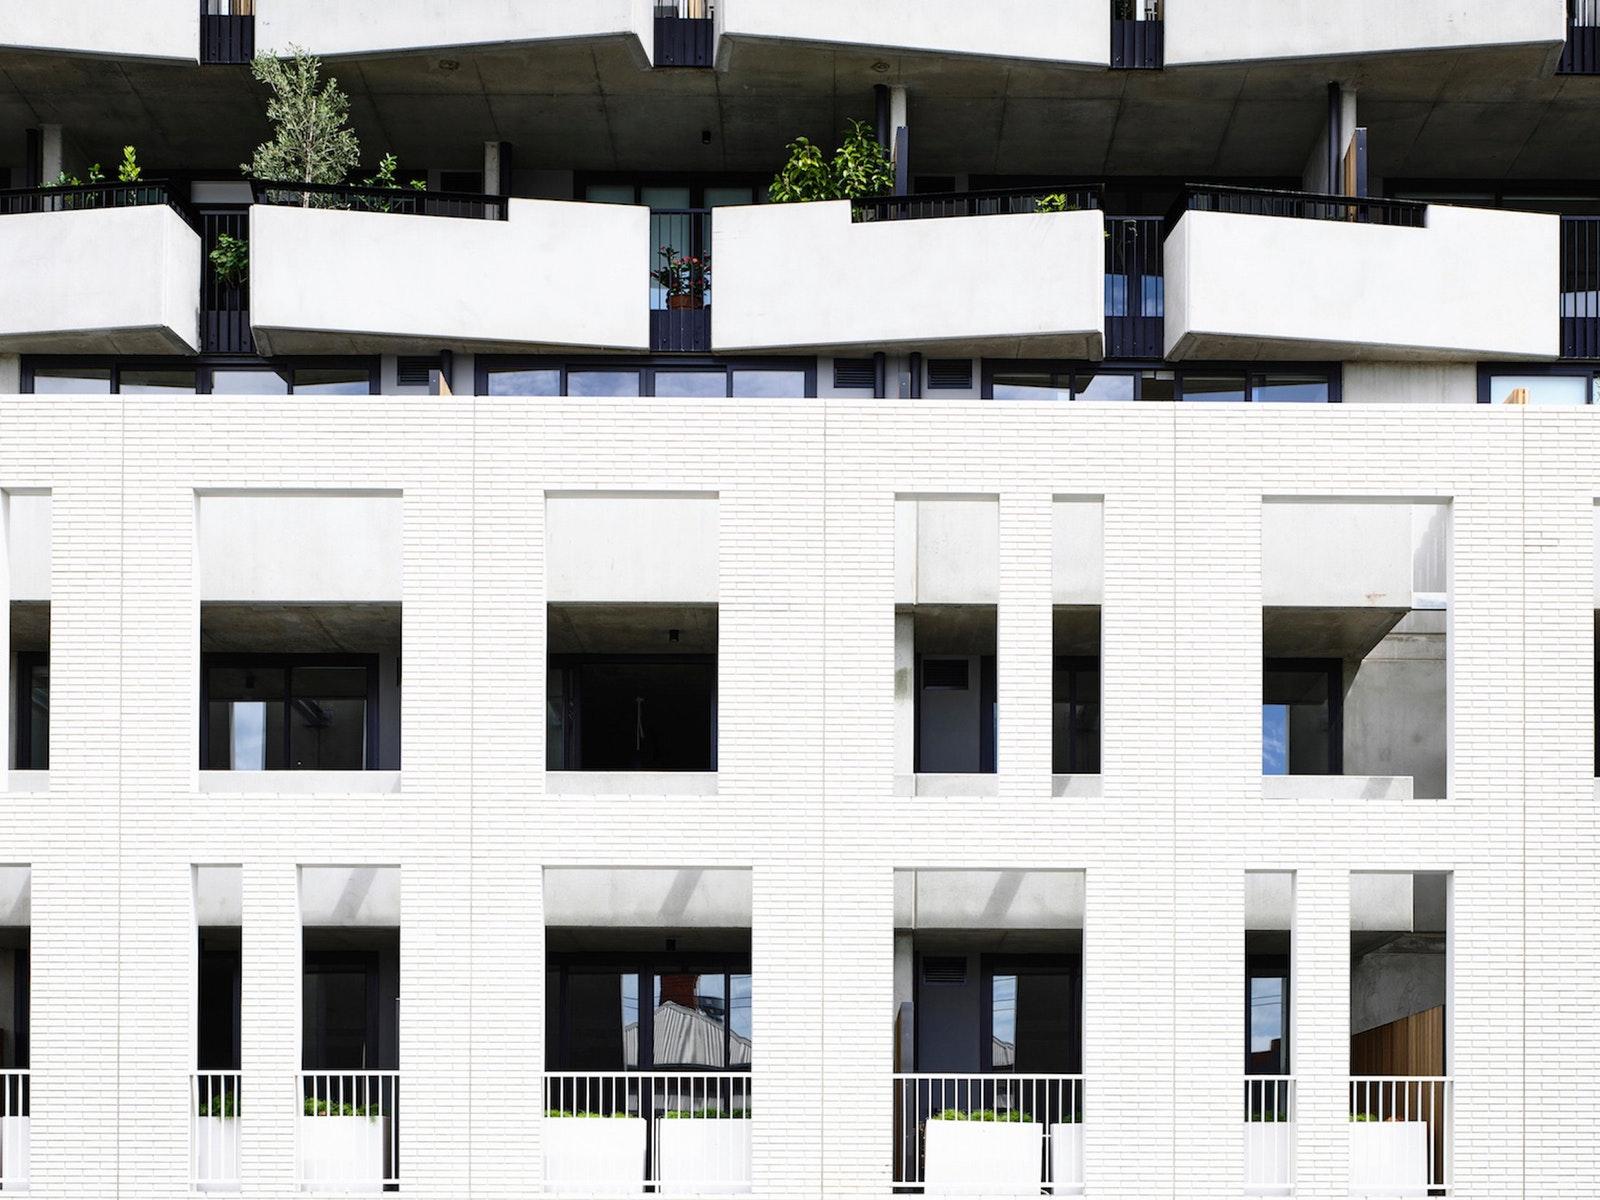 High density happiness: Build-to-rent communities